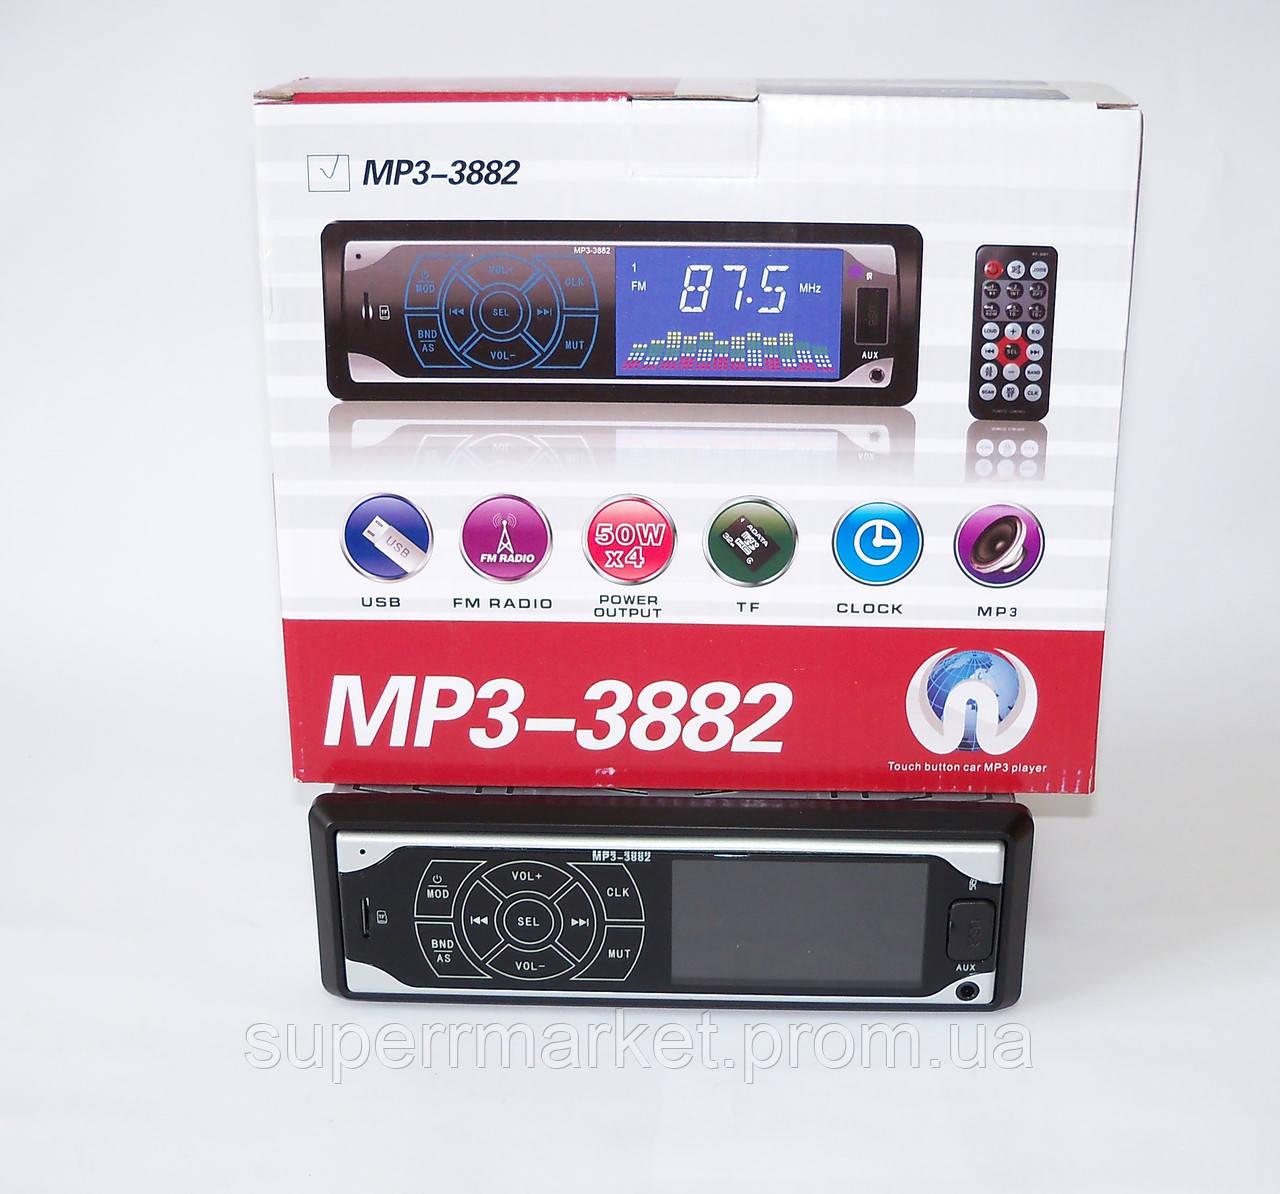 Автомагнитола MP3-3882 с сенсорным дисплеем, FM MP3 USB micriSD TF  AUX ISO